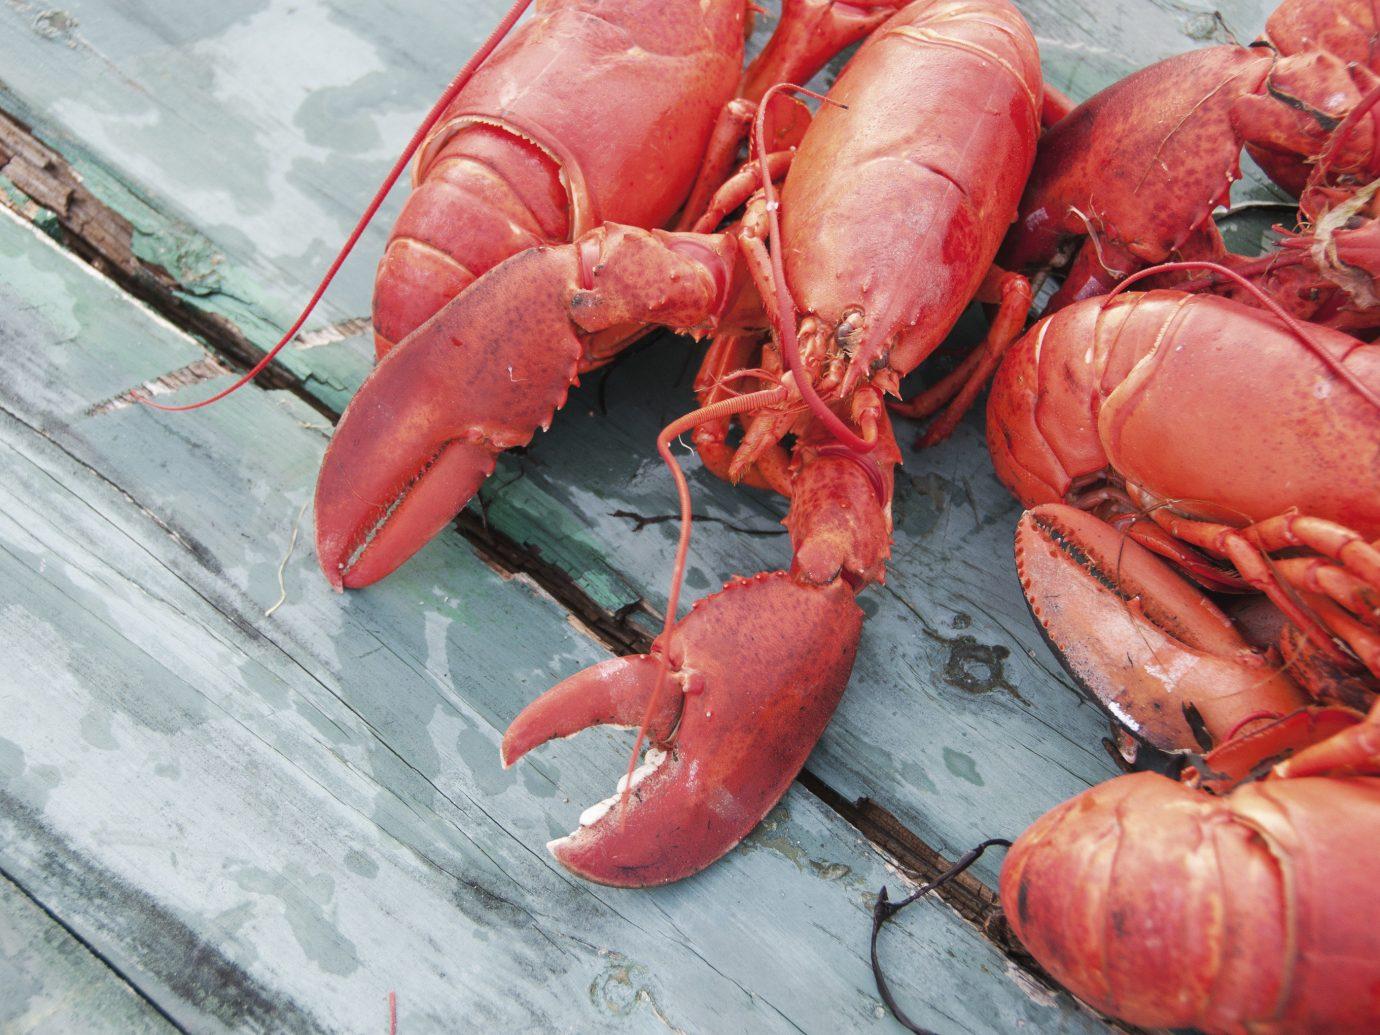 Arts + Culture arthropod invertebrate animal food red lobster dungeness crab Seafood american lobster homarus crustacean decapoda animal source foods fish